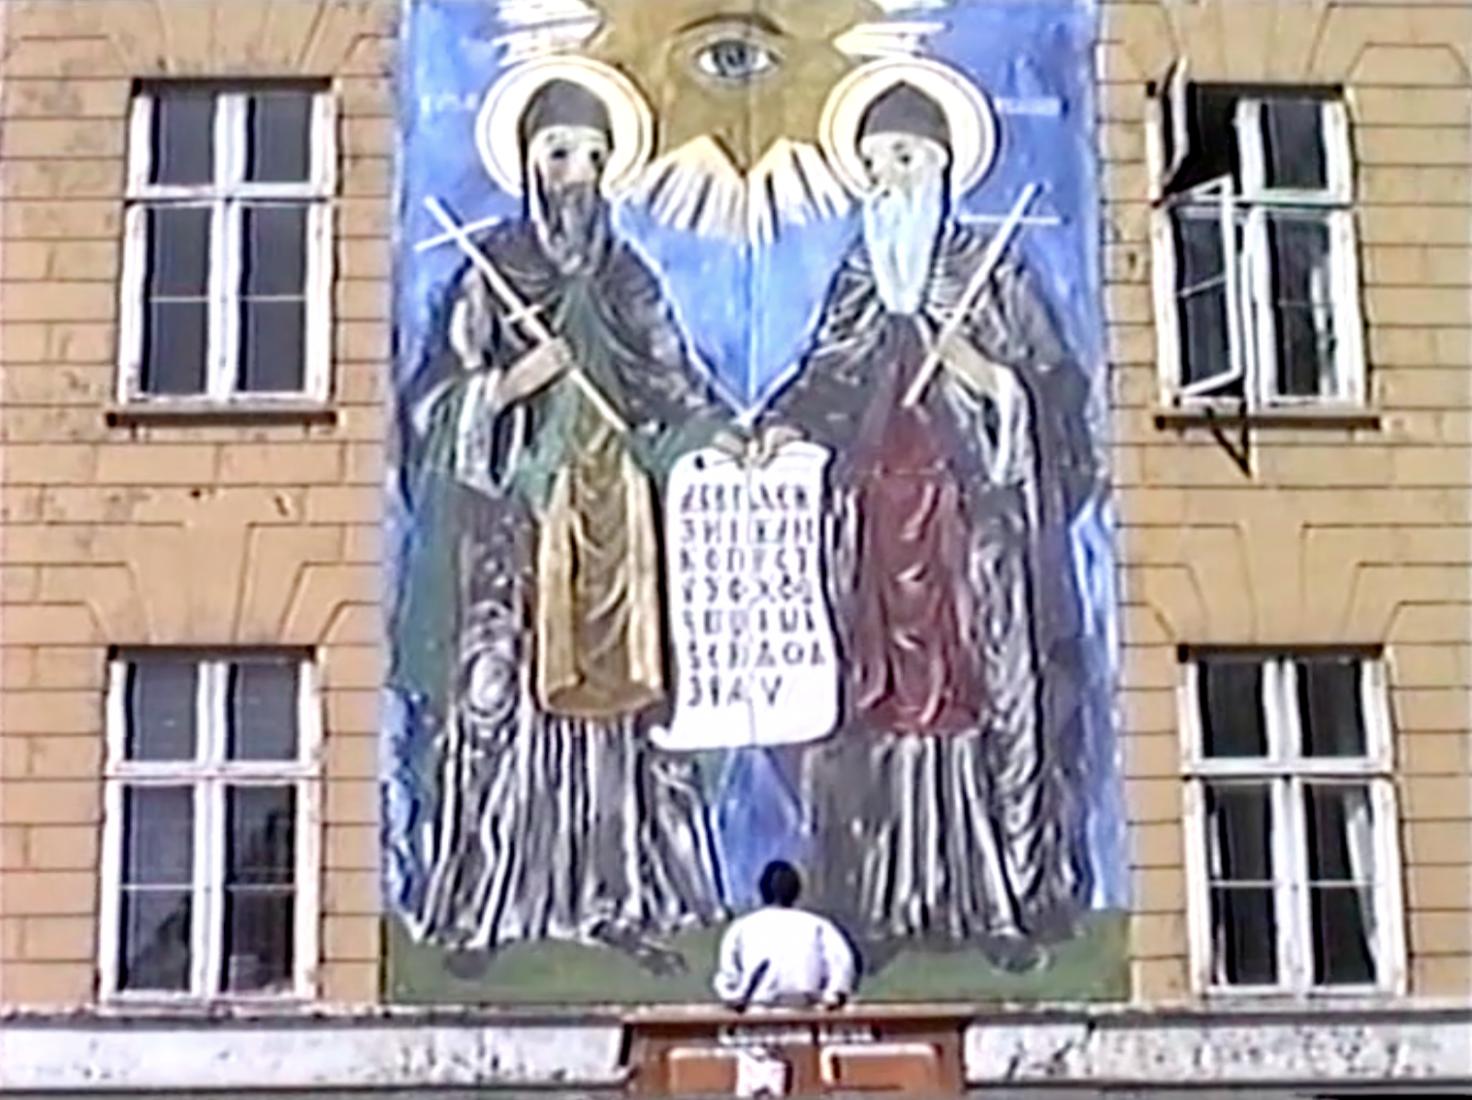 VВасил Симитчиев. Кирилица, Копенхаген, 1988